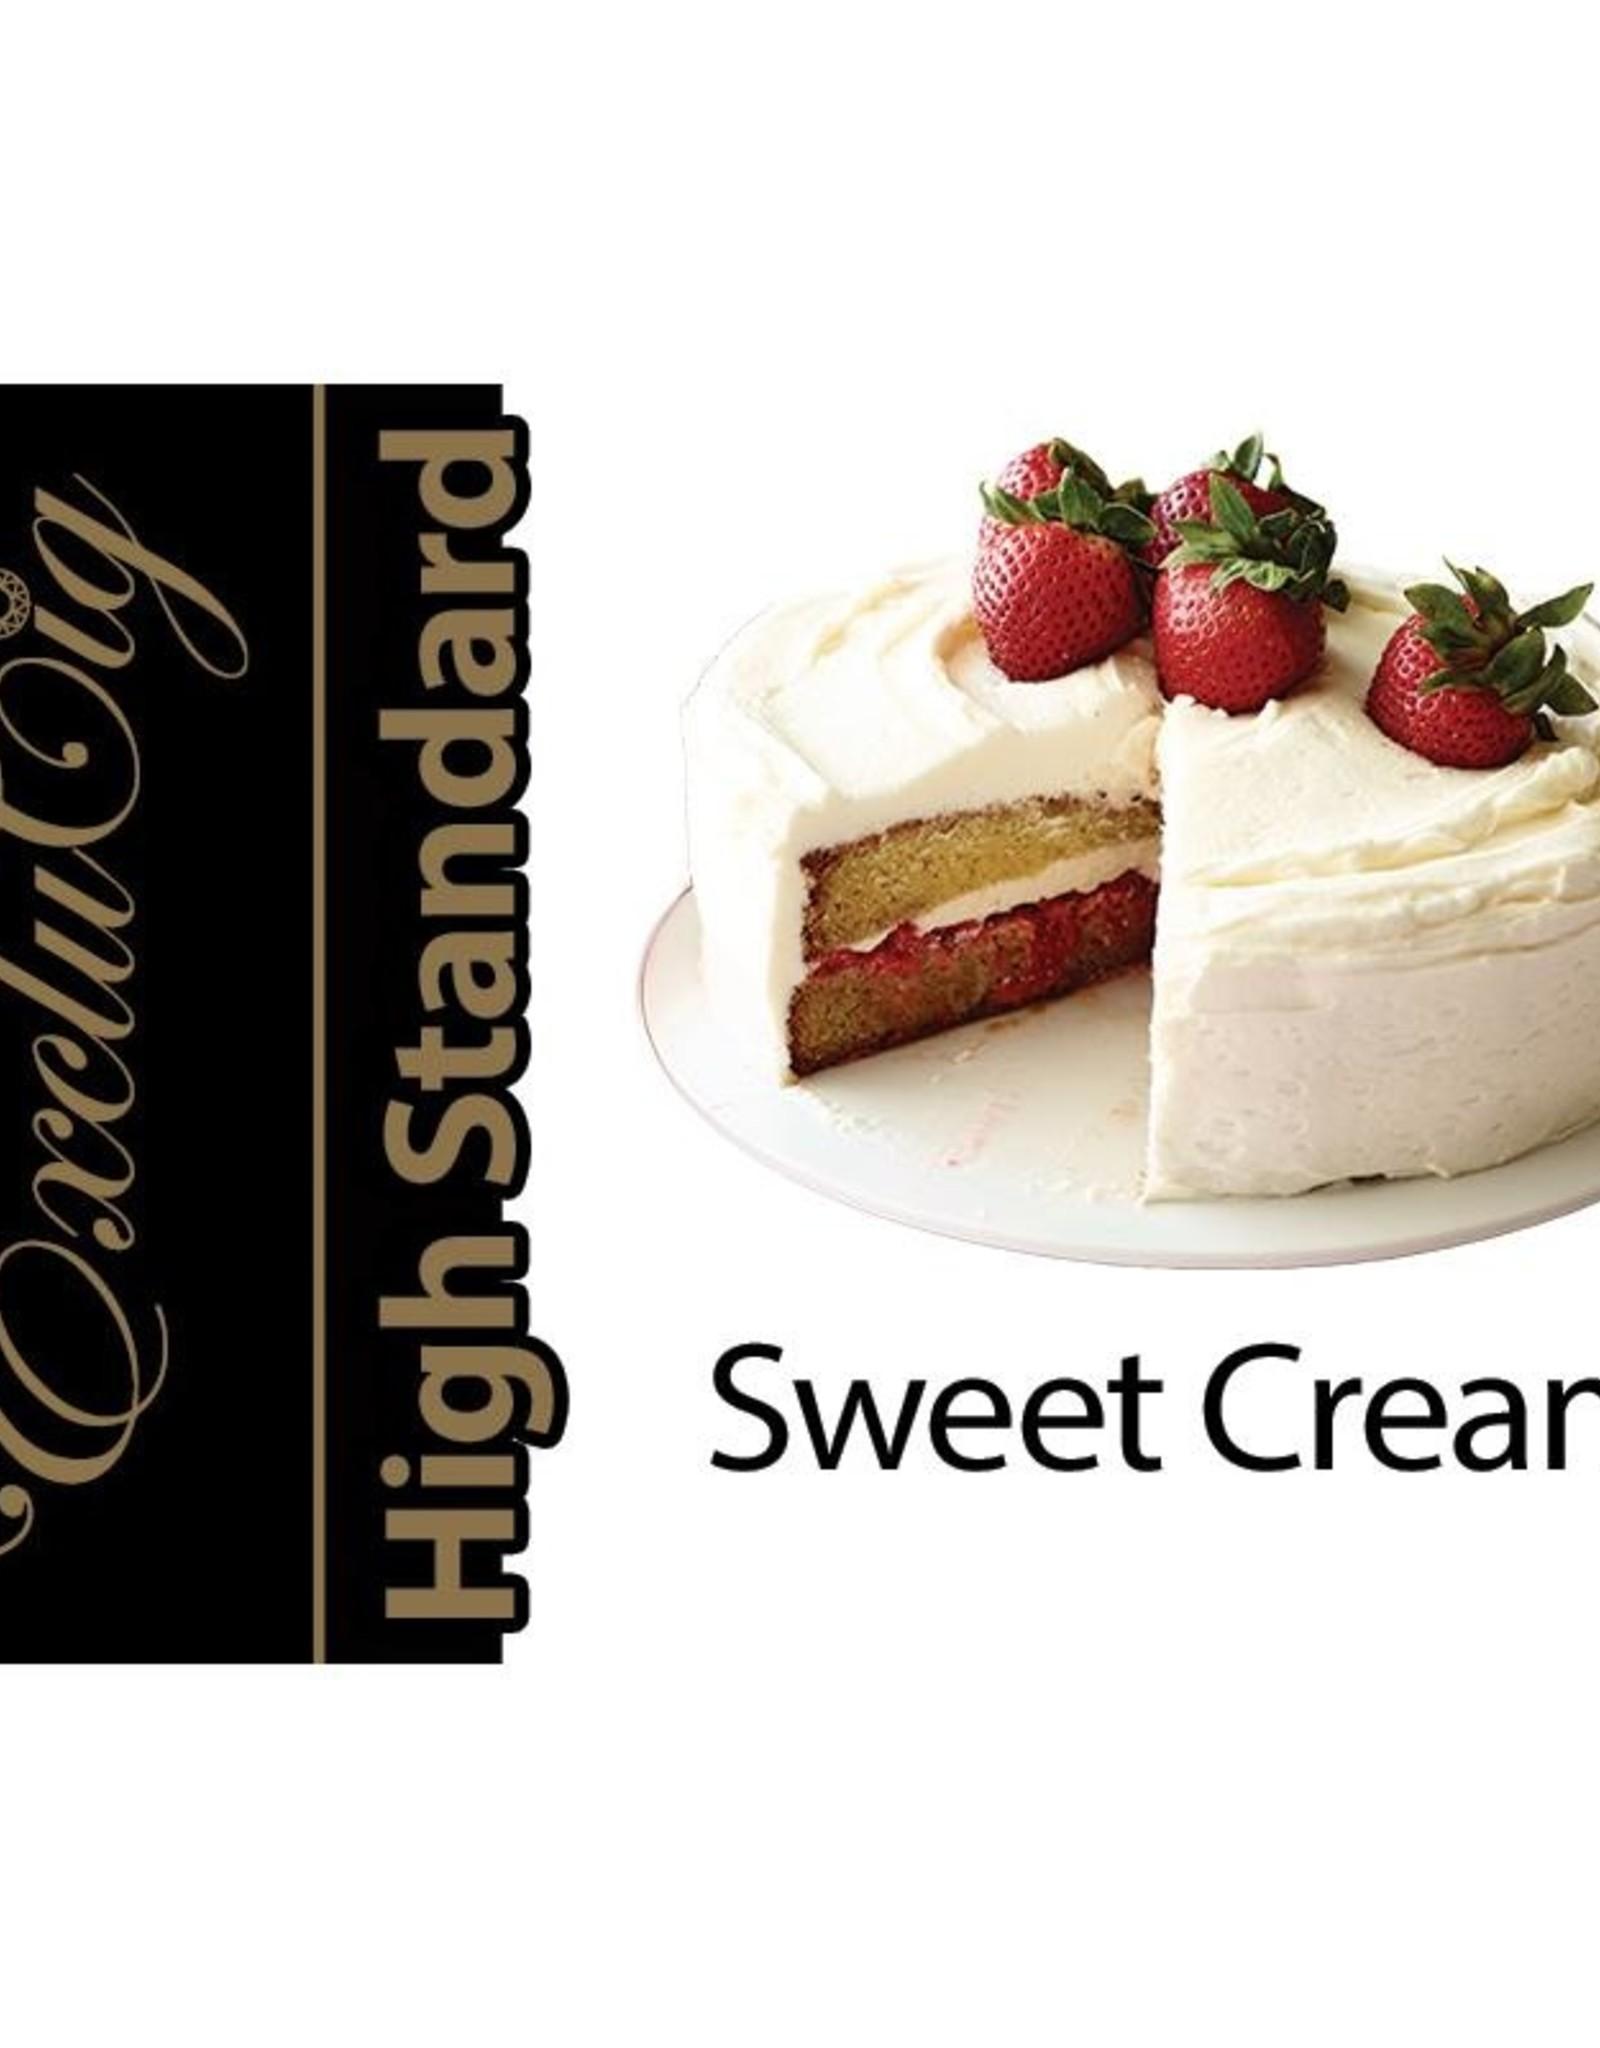 Exclucig Exclucig High Standard E-liquid Sweet Cream 3 mg Nicotine